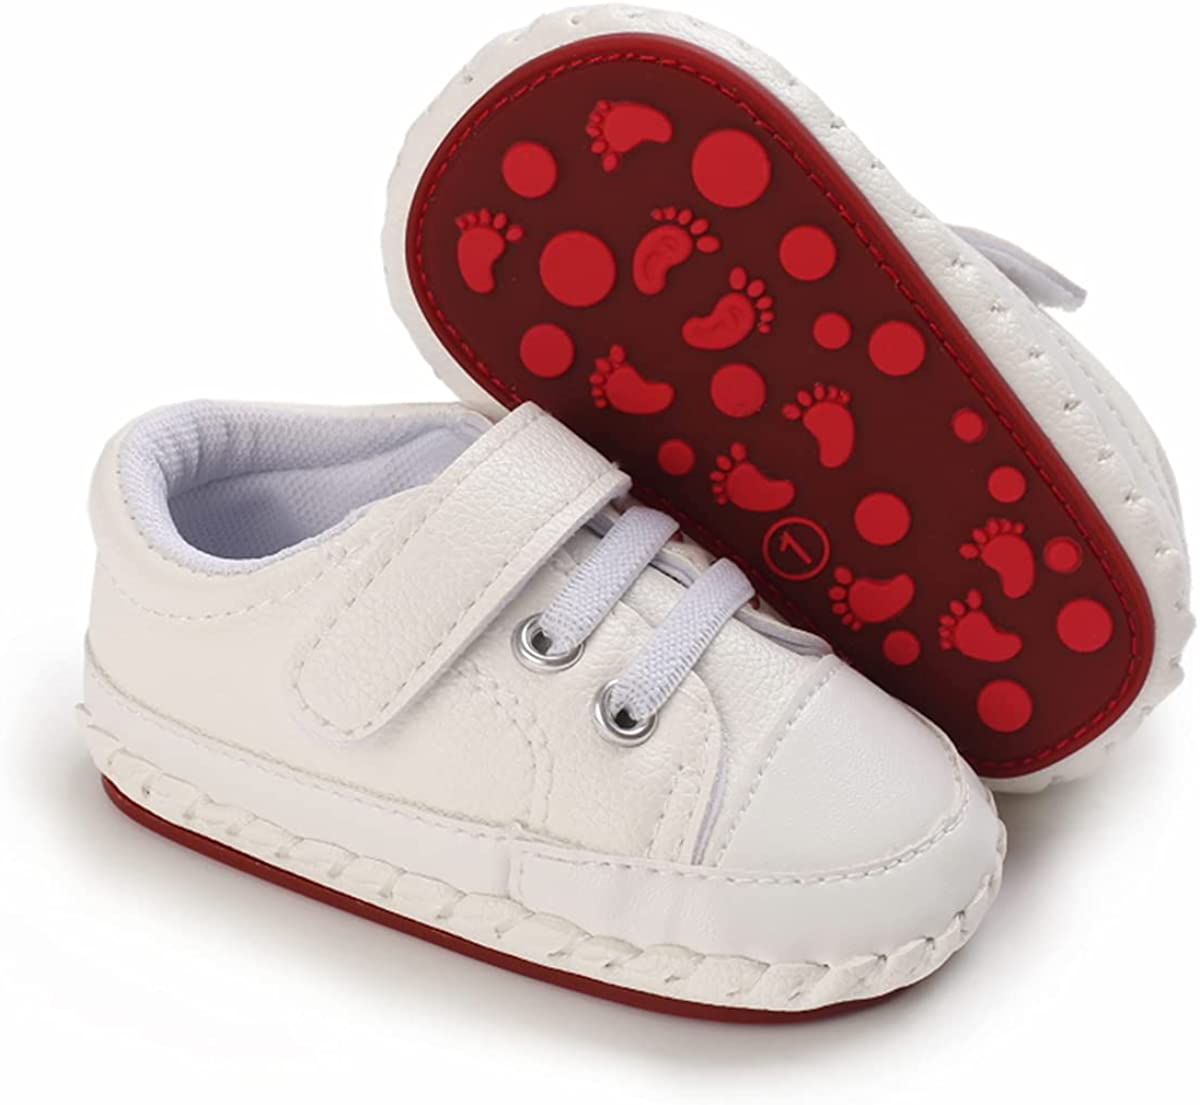 LAFEGEN Baby price Boys Girls Walking Shoes PU Bottom Le Non Cheap bargain Slip Hard